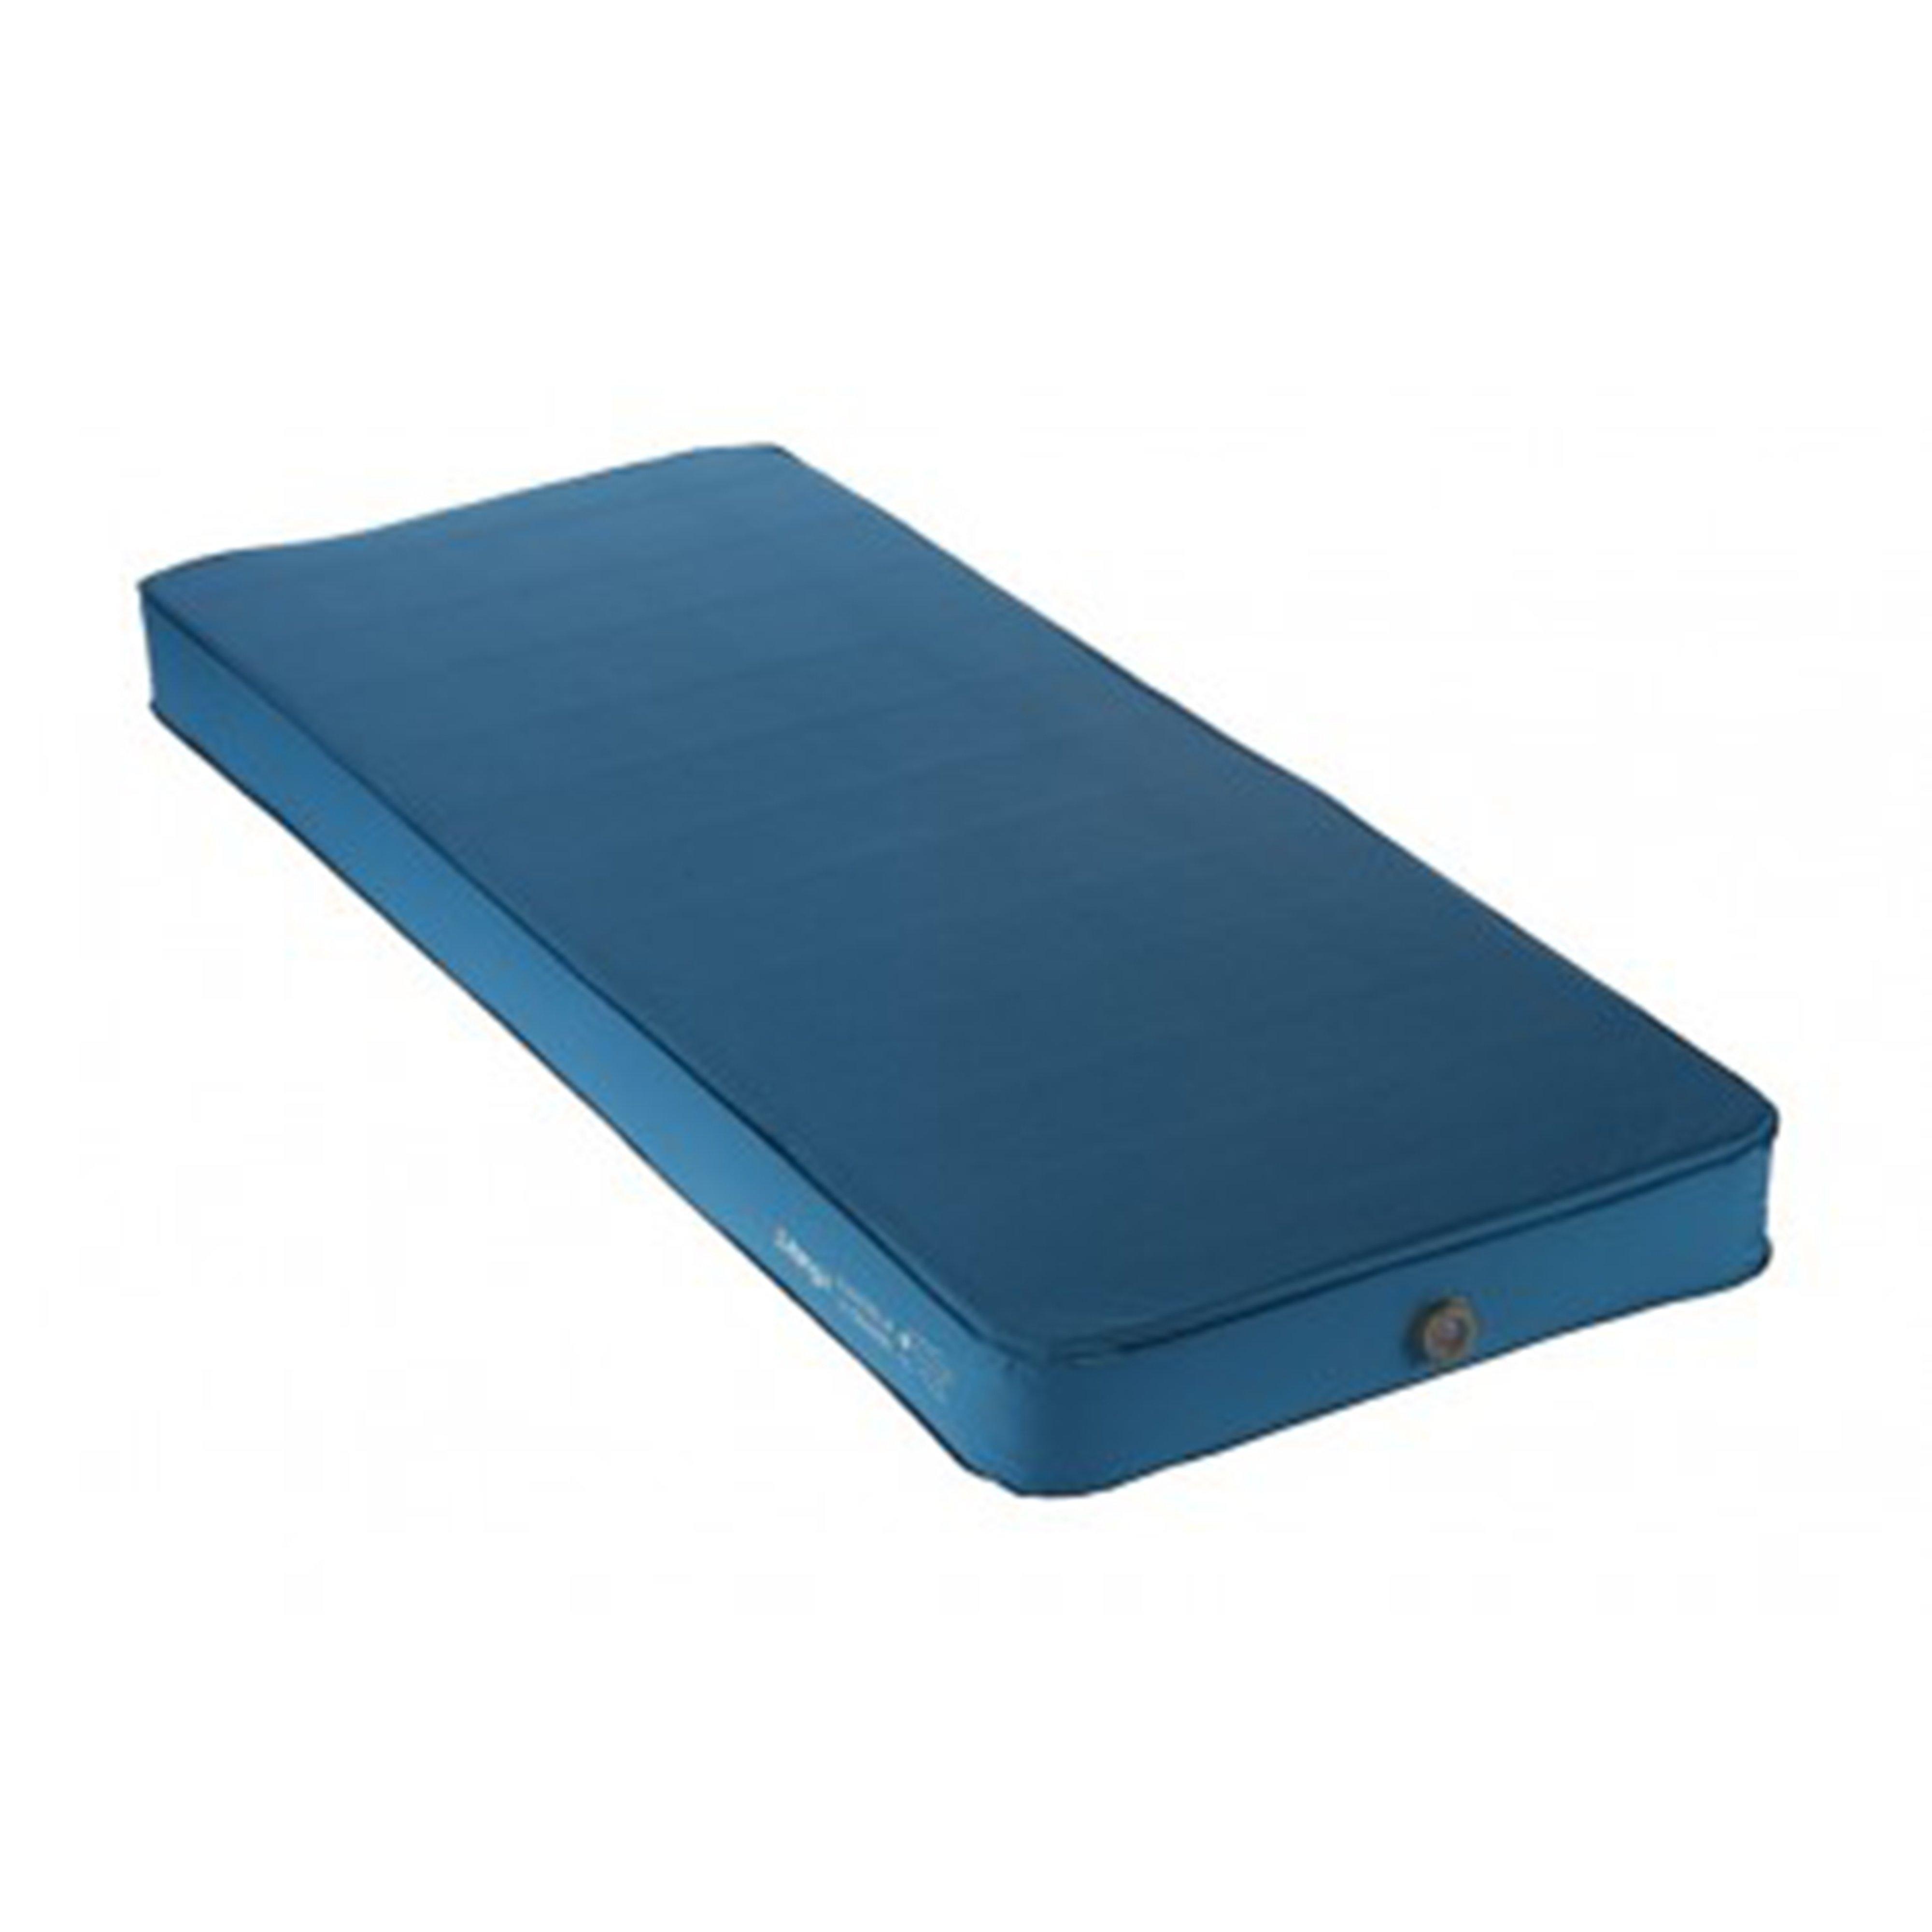 VANGO Shangri-La 15cm Single Sleeping Mat, Blue/Blue